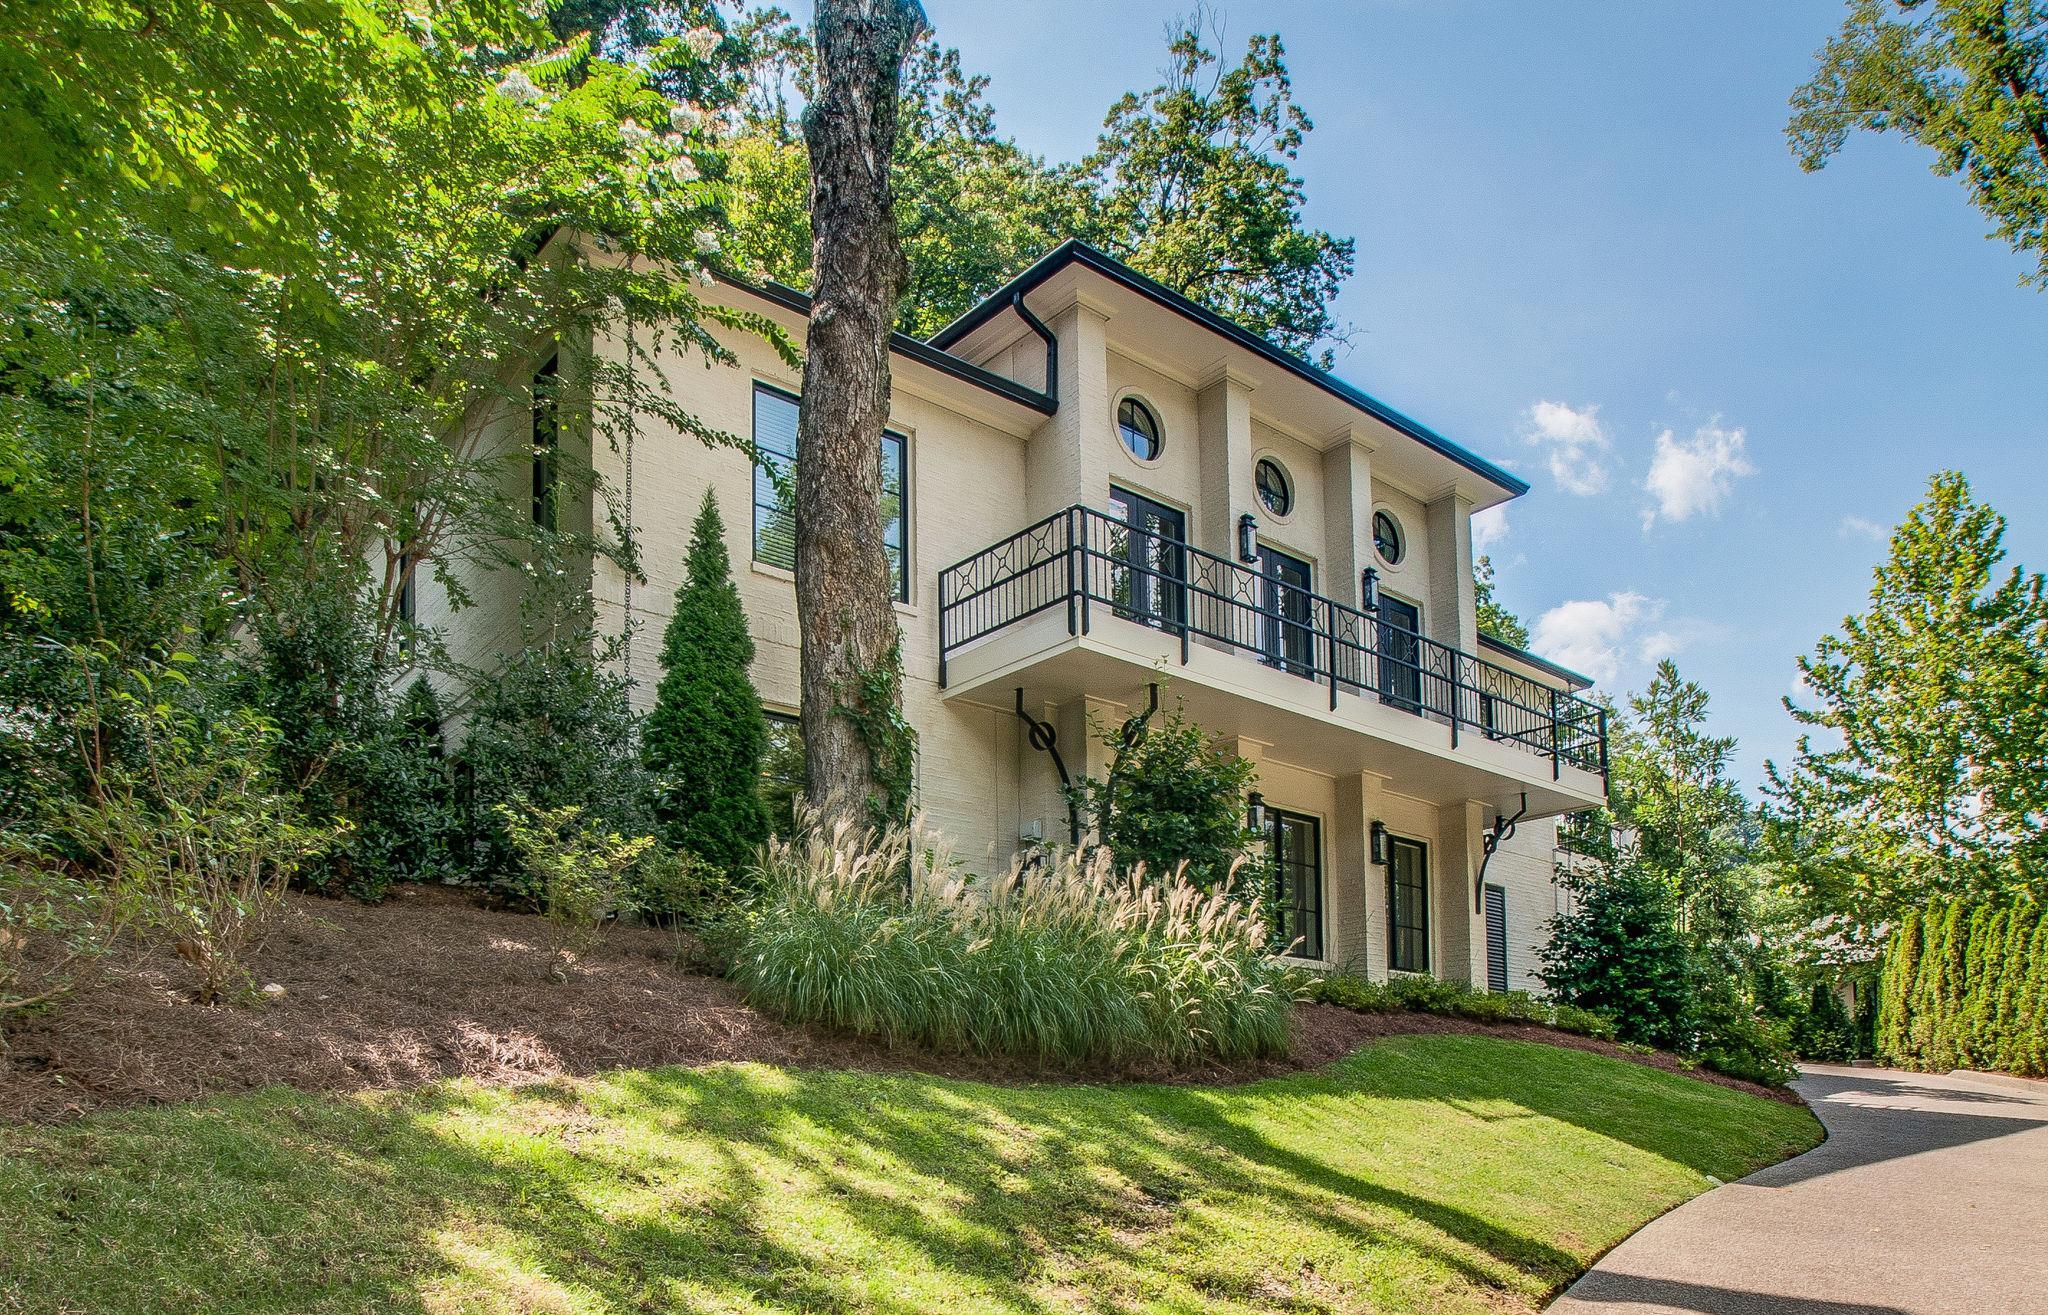 1175 Travelers Ridge Dr, Nashville, TN 37220 - Nashville, TN real estate listing